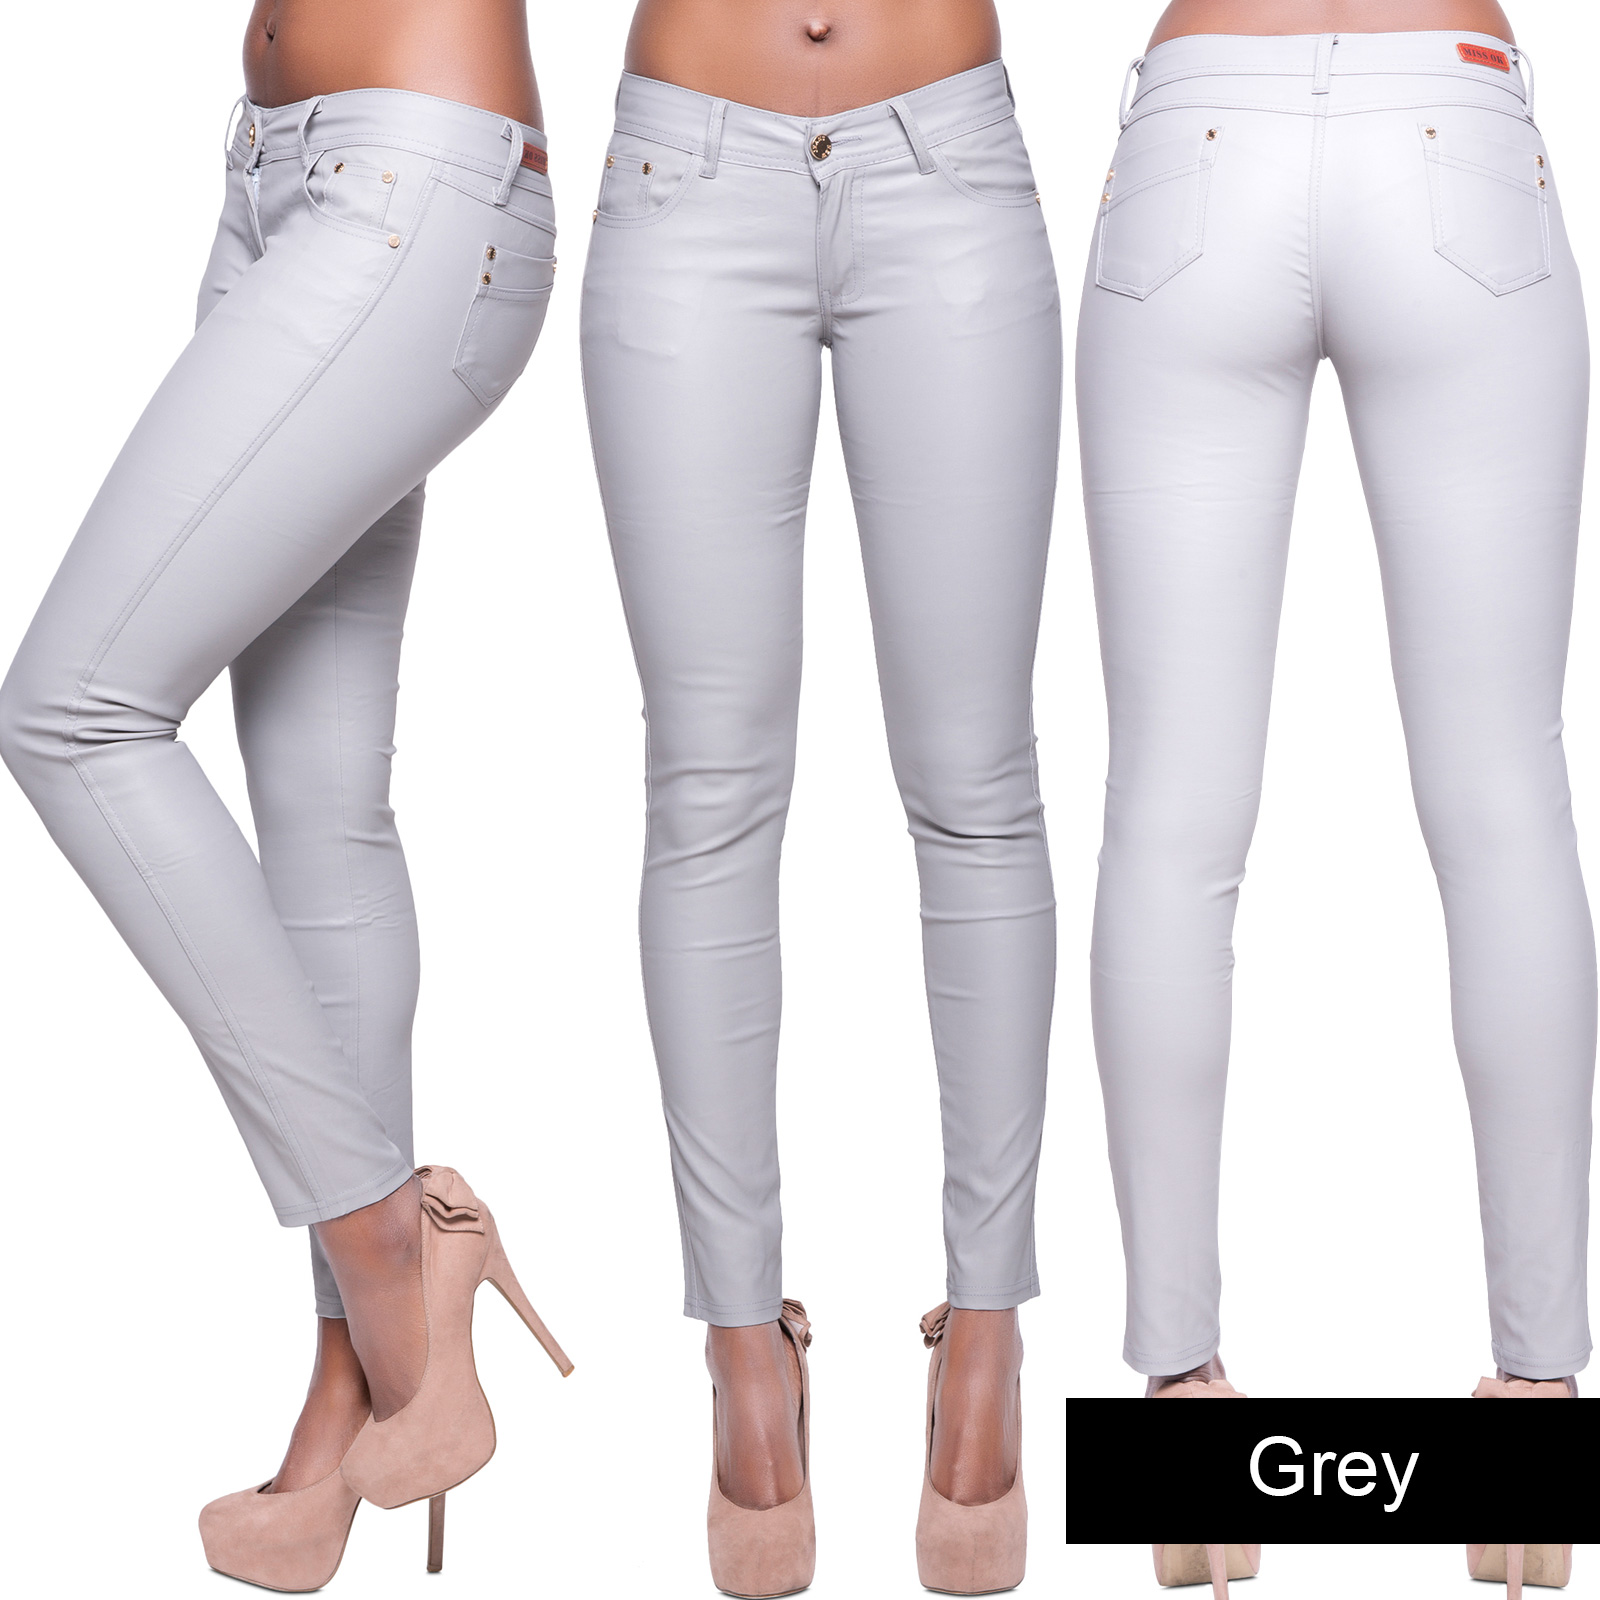 Womens Black Wet Look Leather Jeans Skinny Trouser ...